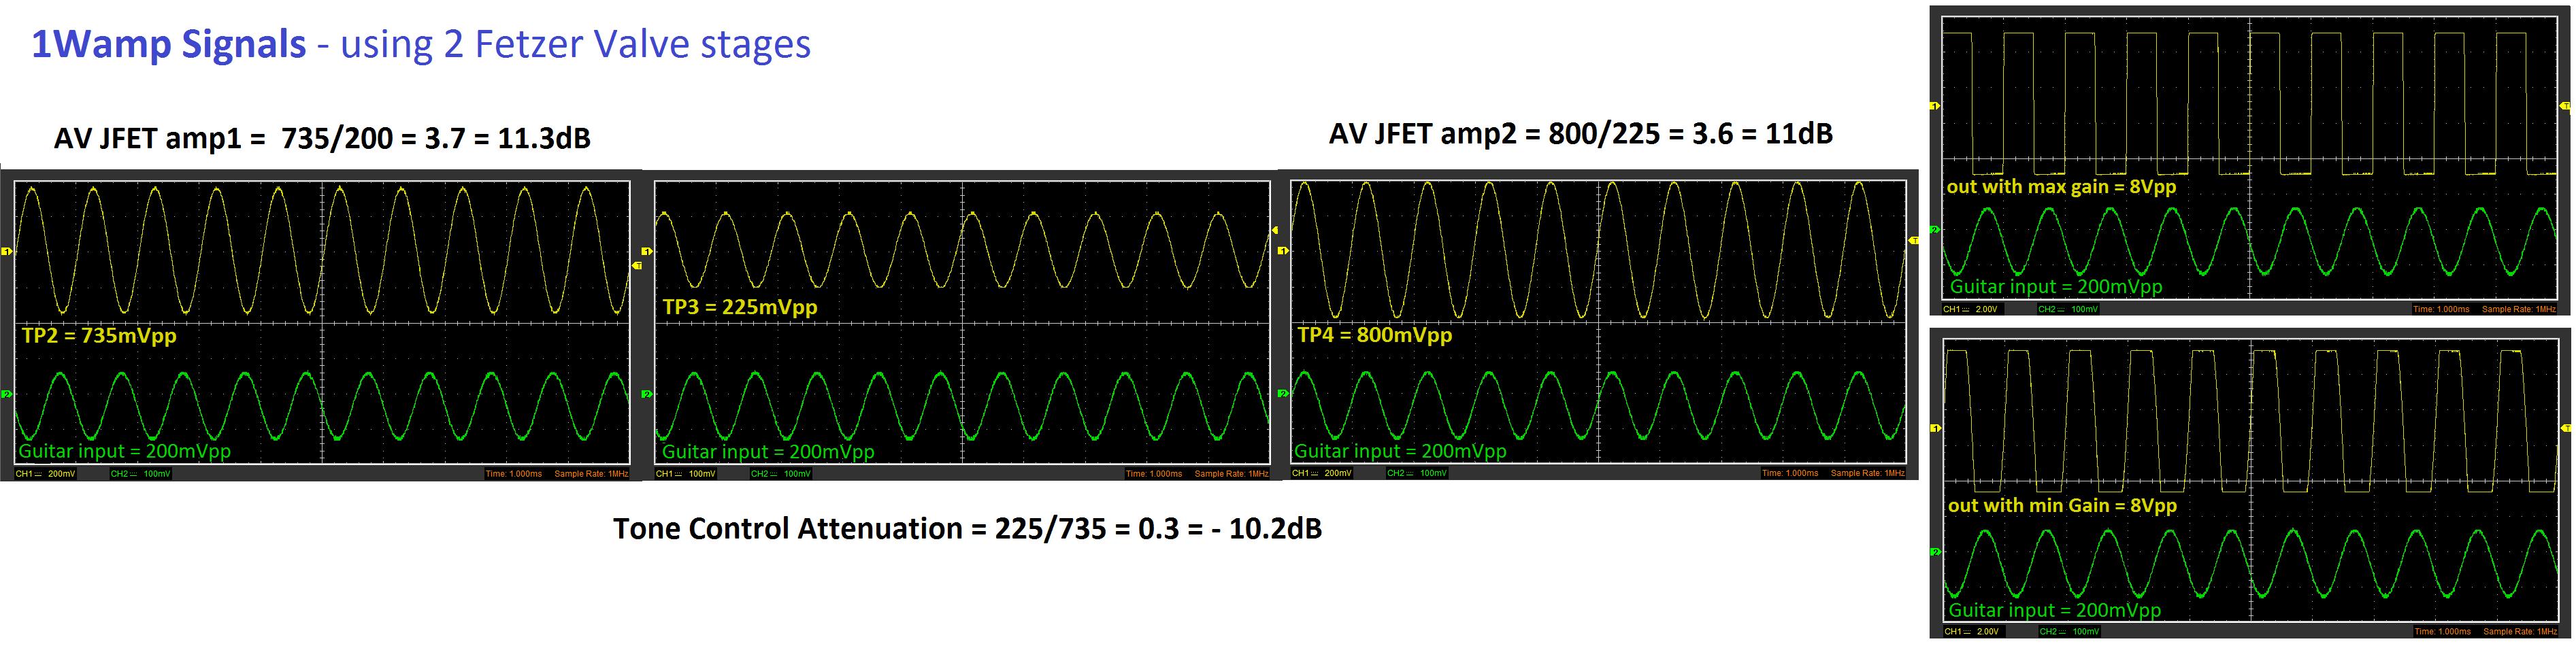 Electrosmash 1wamp Electroc Guitar Amplifier Two Transistor Tone Controller Electronic Circuits And Diagram Signals Fetzer Valve